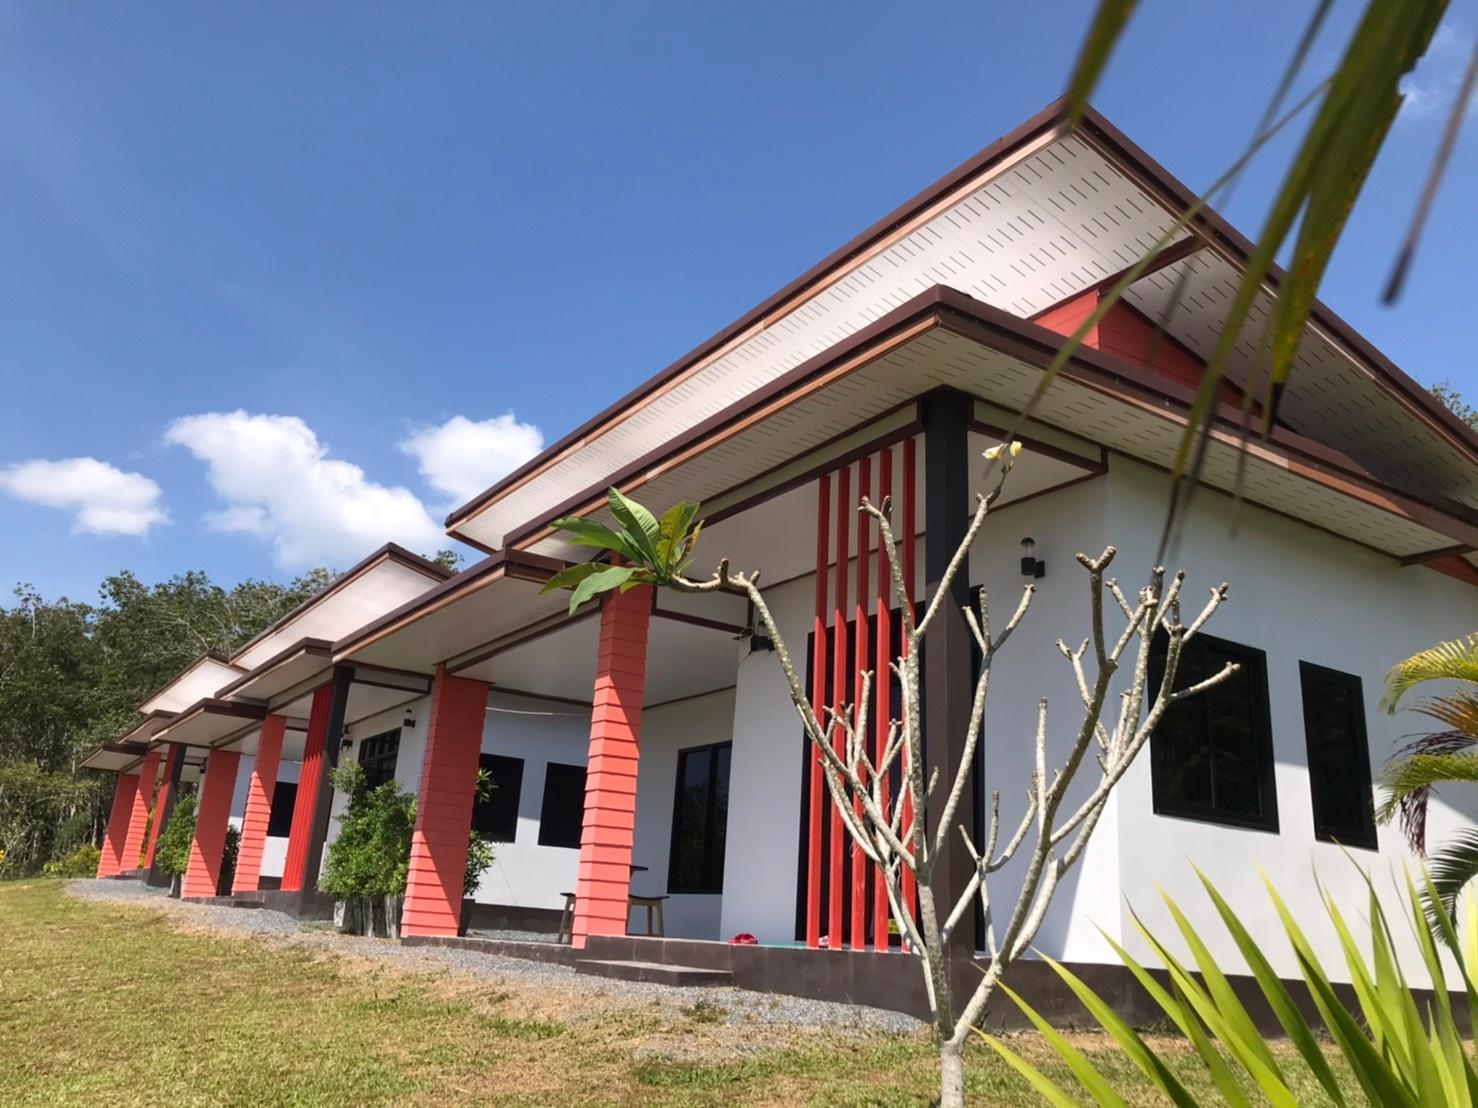 Krabi Palm Garden House on Hill บ้านเดี่ยว 1 ห้องนอน 1 ห้องน้ำส่วนตัว ขนาด 58 ตร.ม. – หาดคลองม่วง